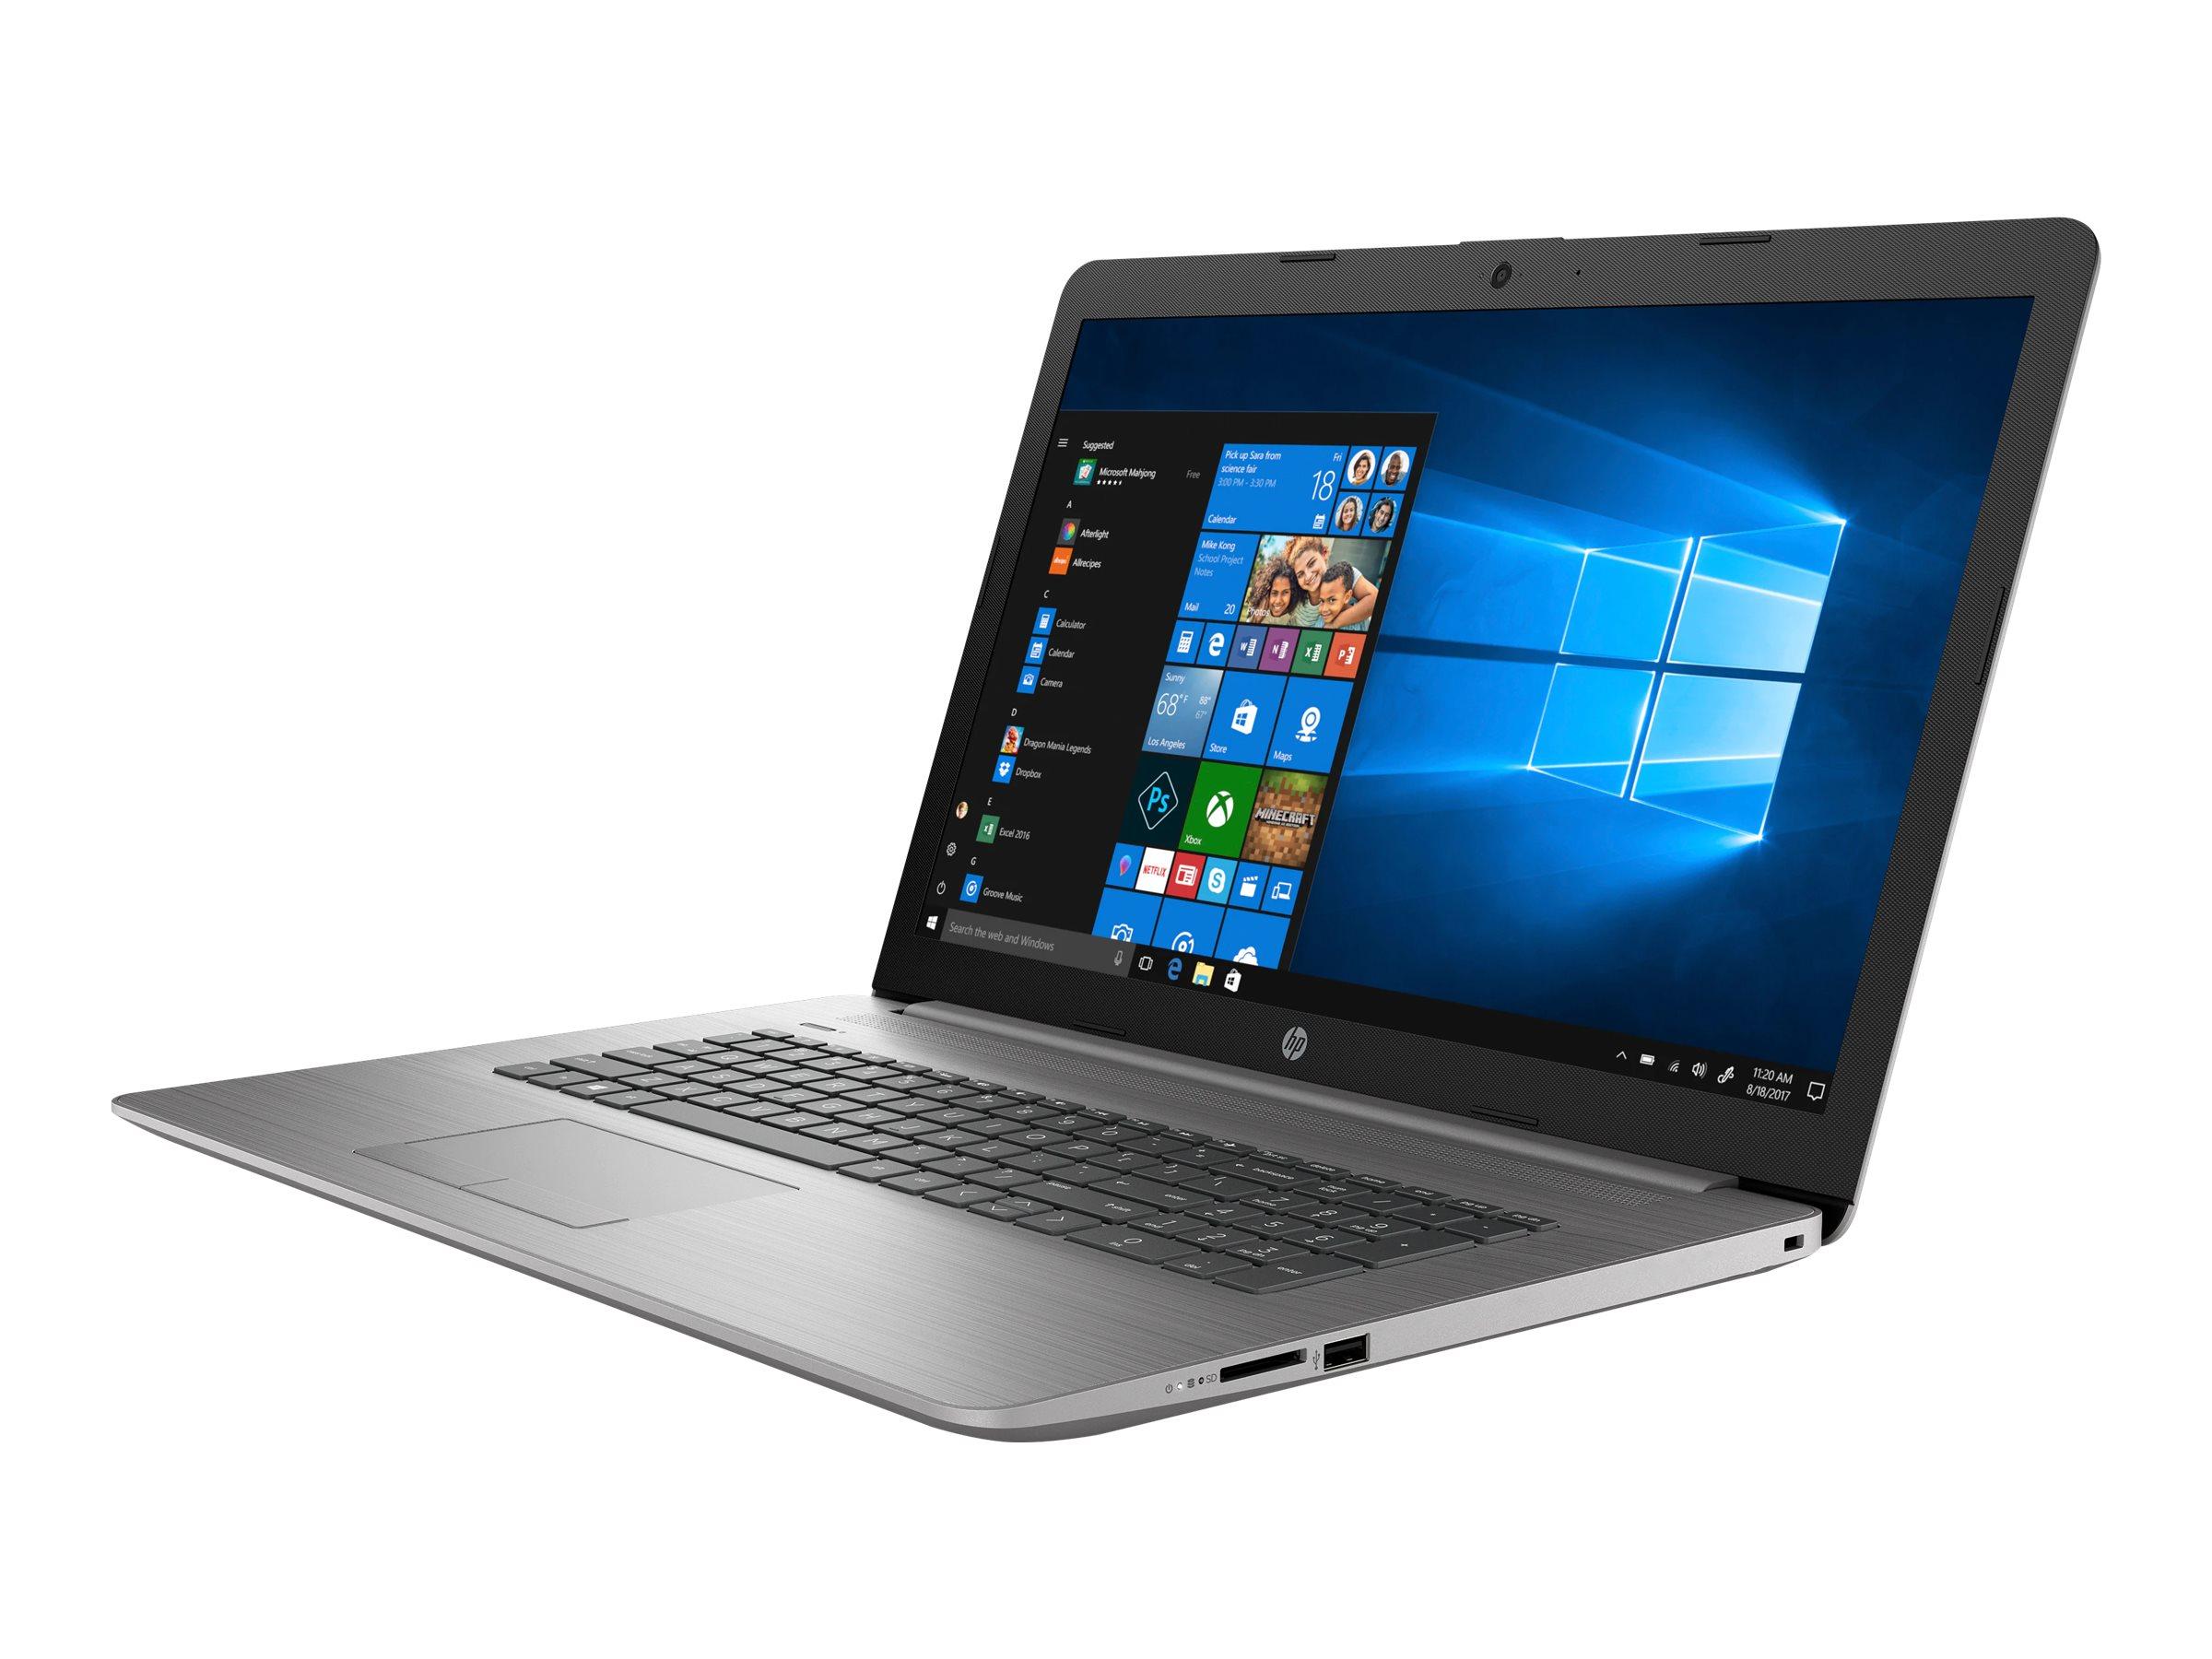 "HP 470 G7 - Core i7 10510U / 1.8 GHz - Win 10 Pro 64-Bit - 8 GB RAM - 256 GB SSD NVMe, TLC, HP Value - 43.9 cm (17.3"")"